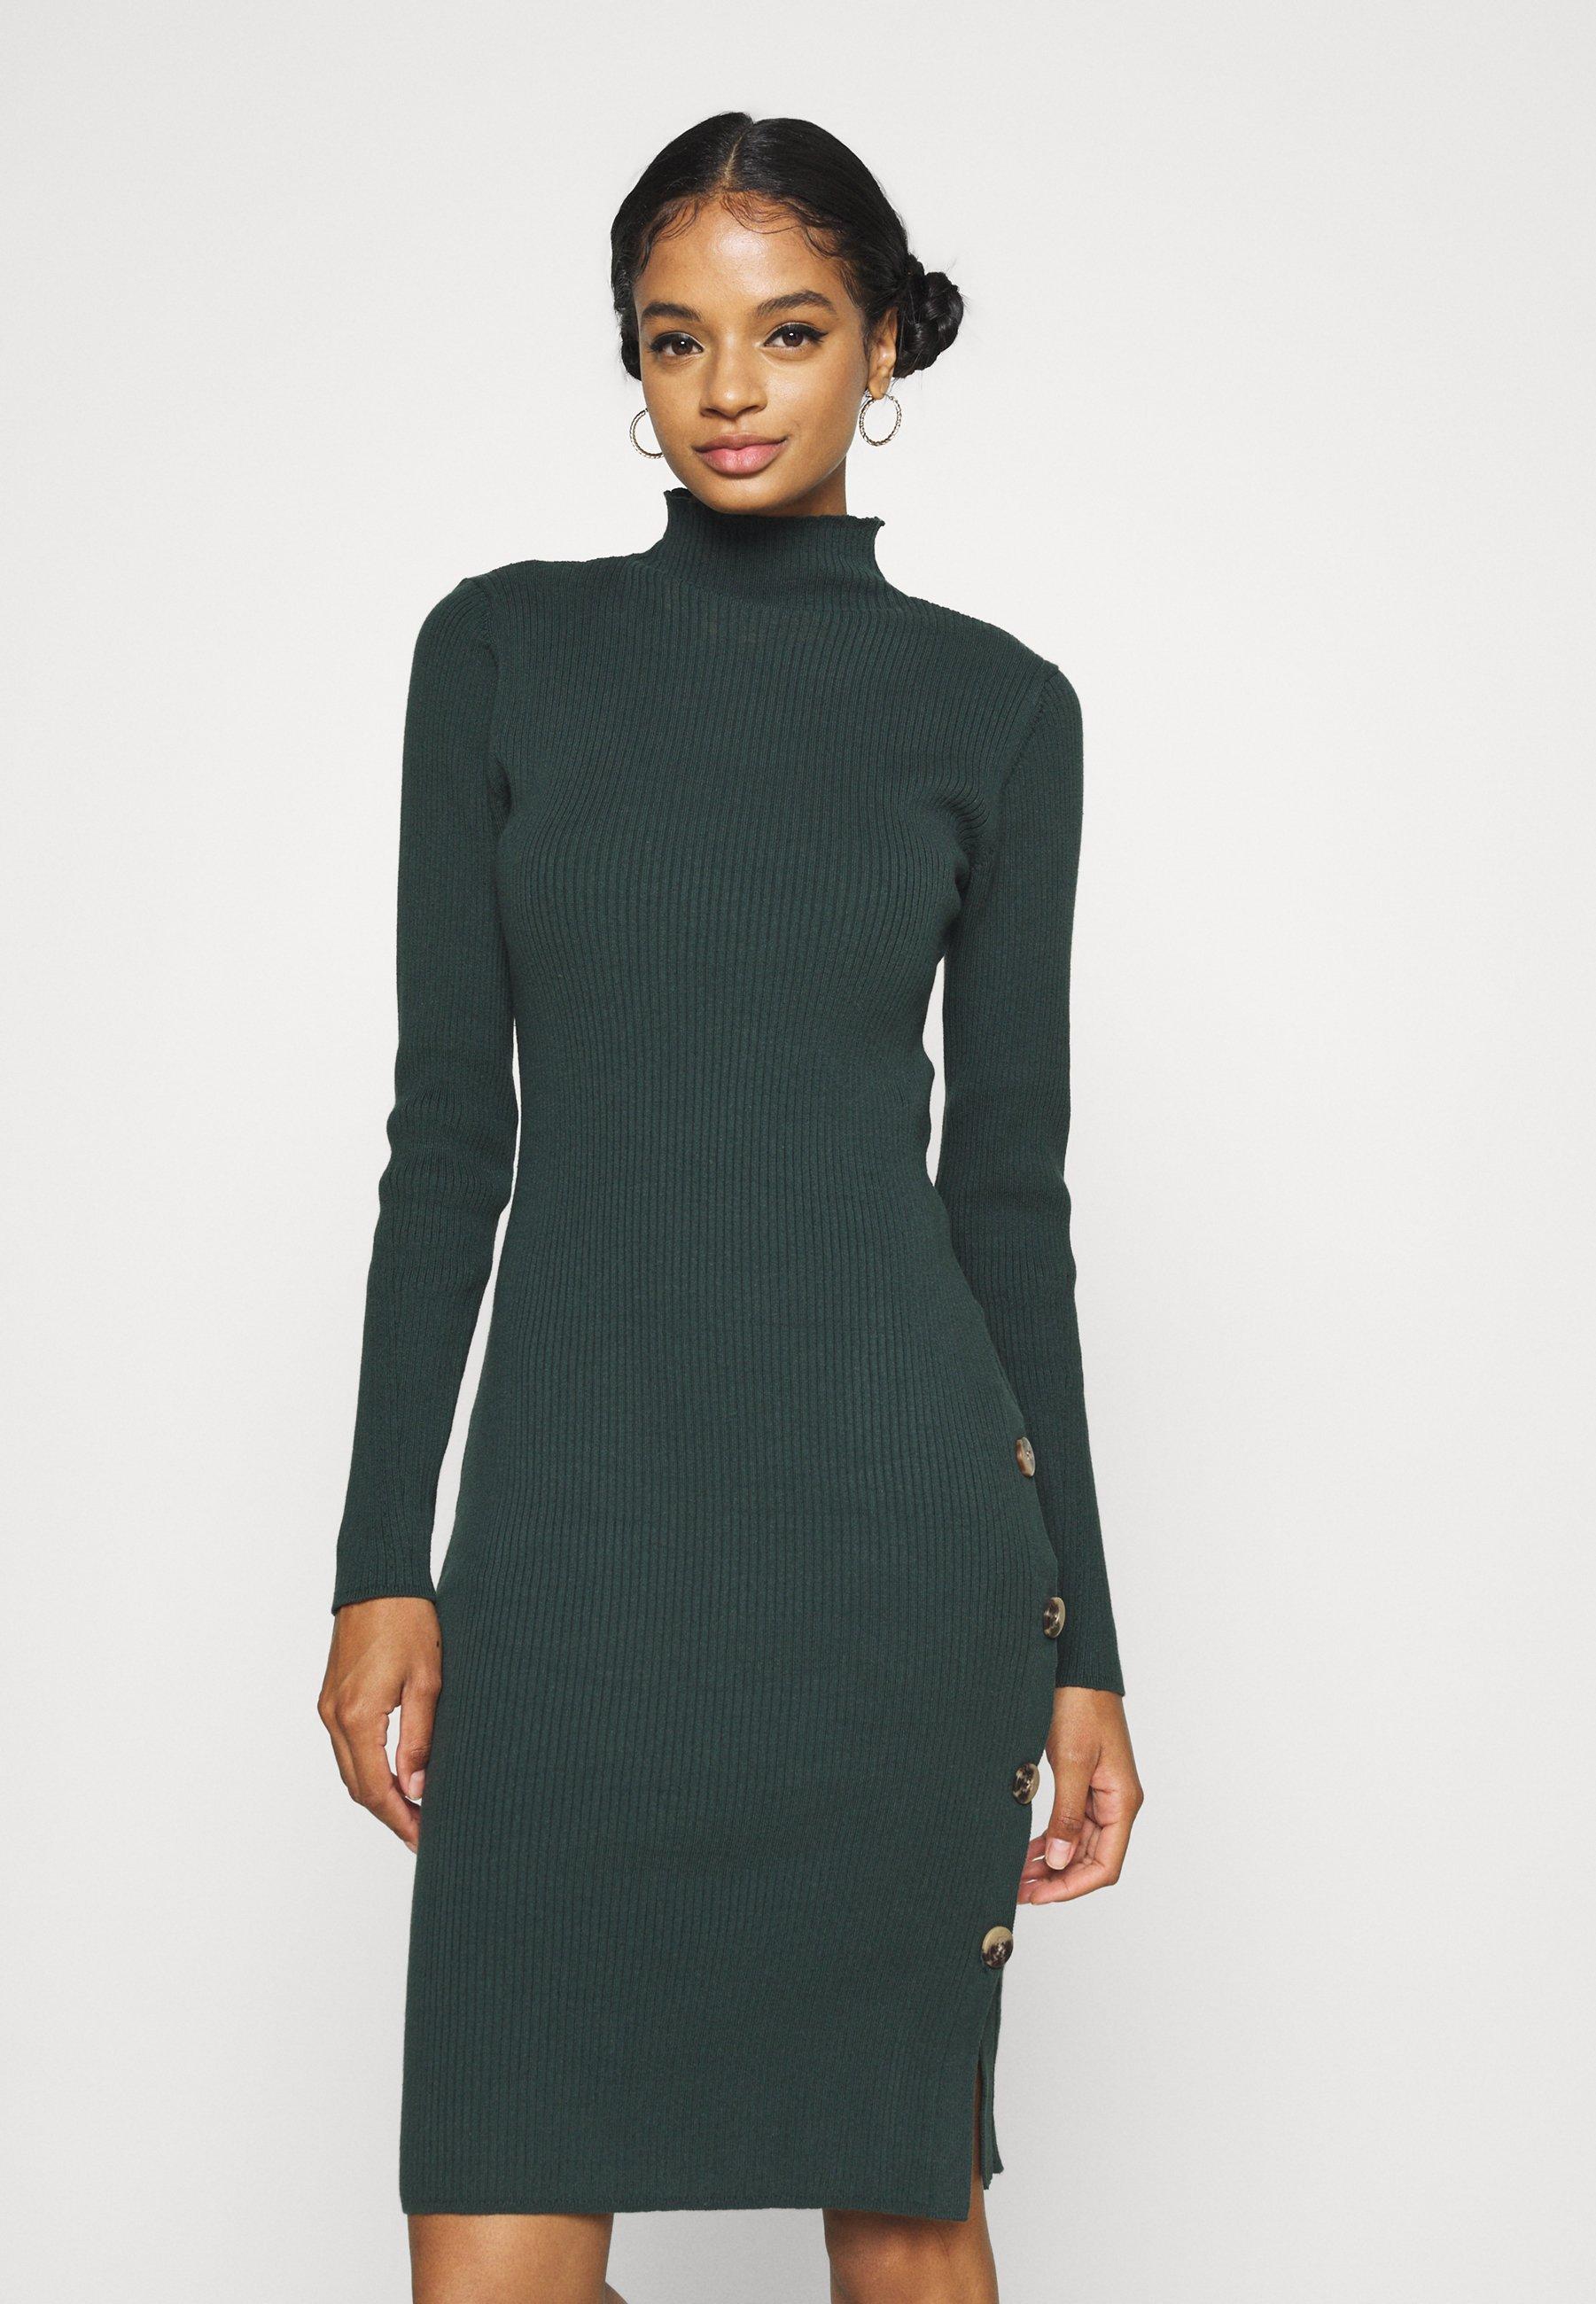 Donna VISOLTO BUTTON DRESS - Tubino